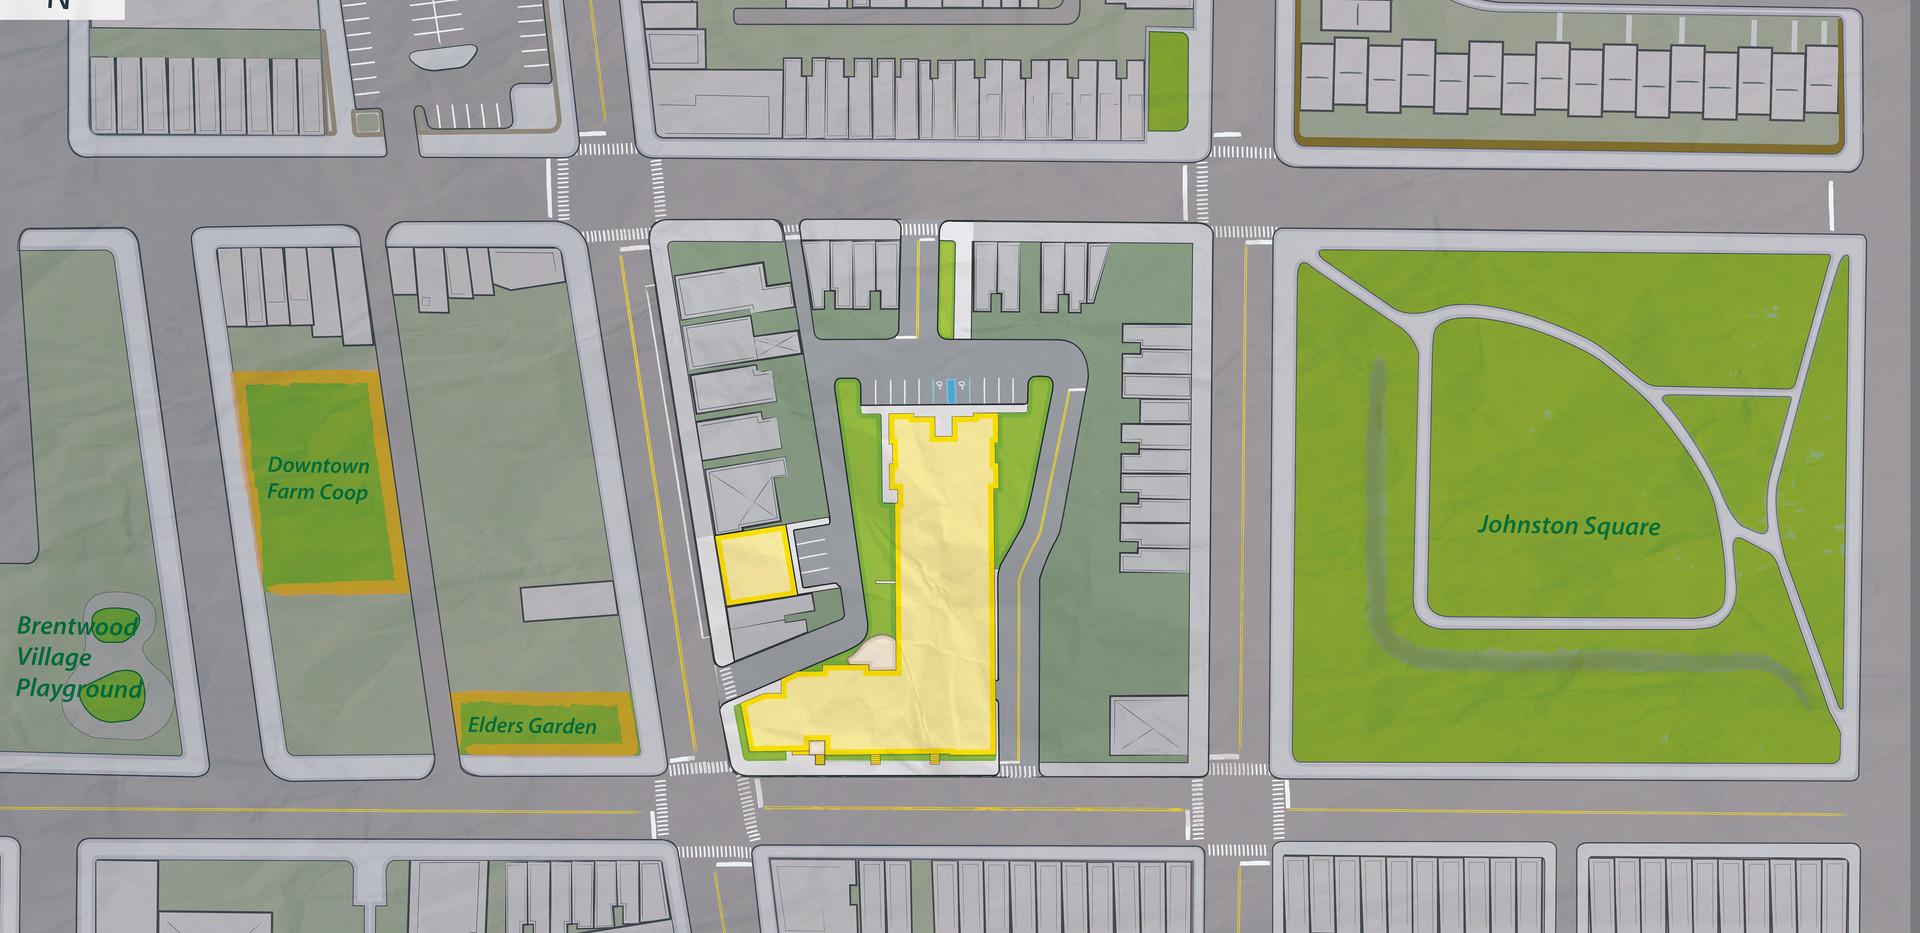 Cohn Alley Program Site Plan, Camden, NJ